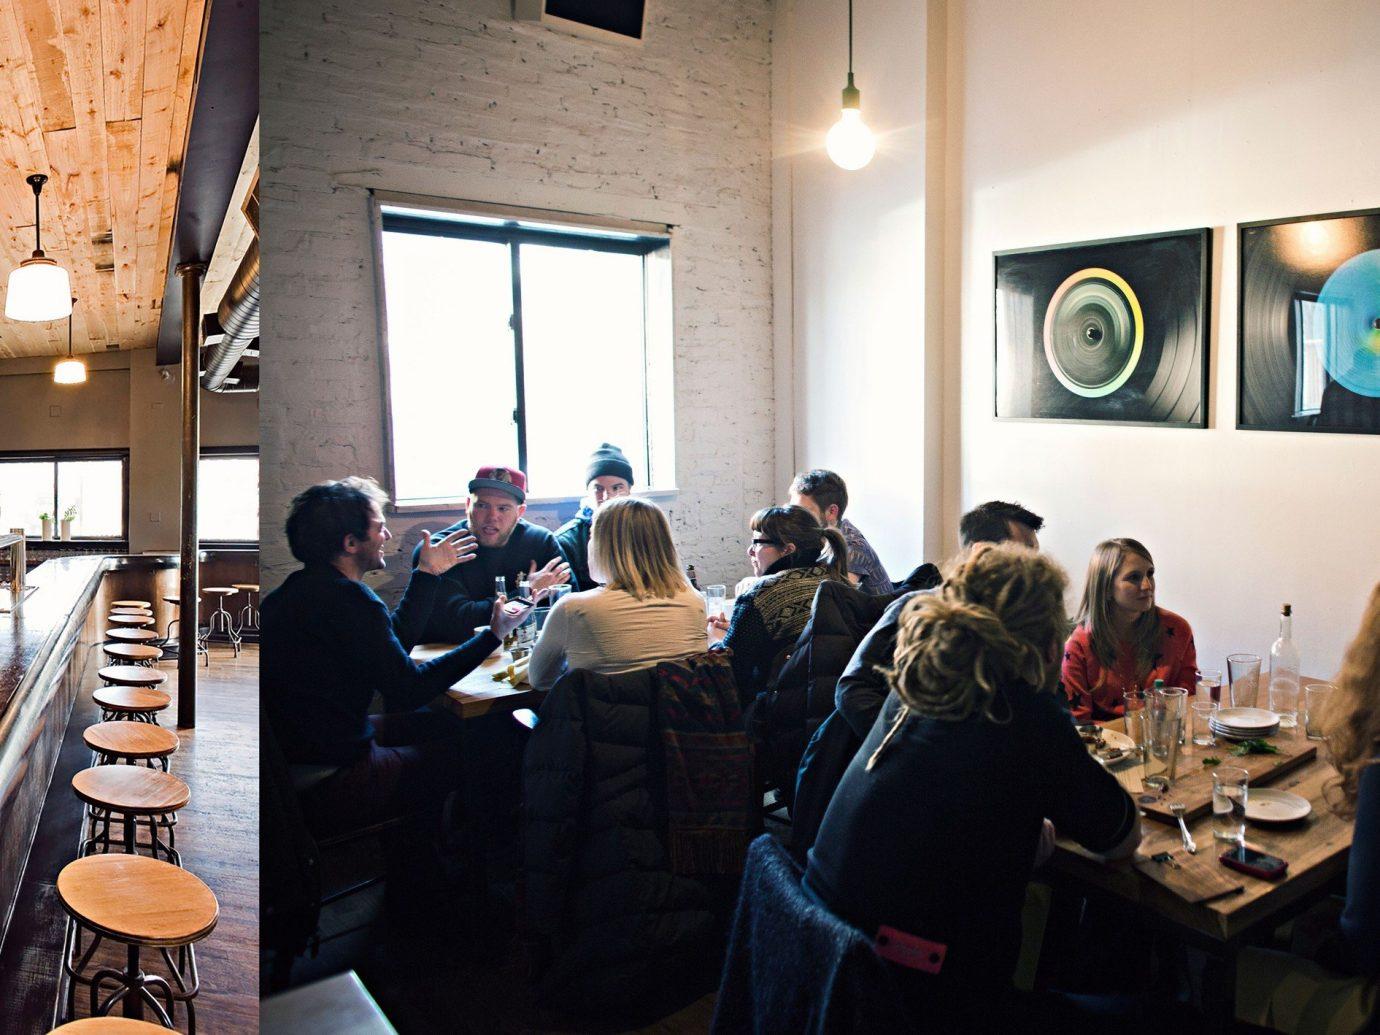 Food + Drink indoor person ceiling people Bar